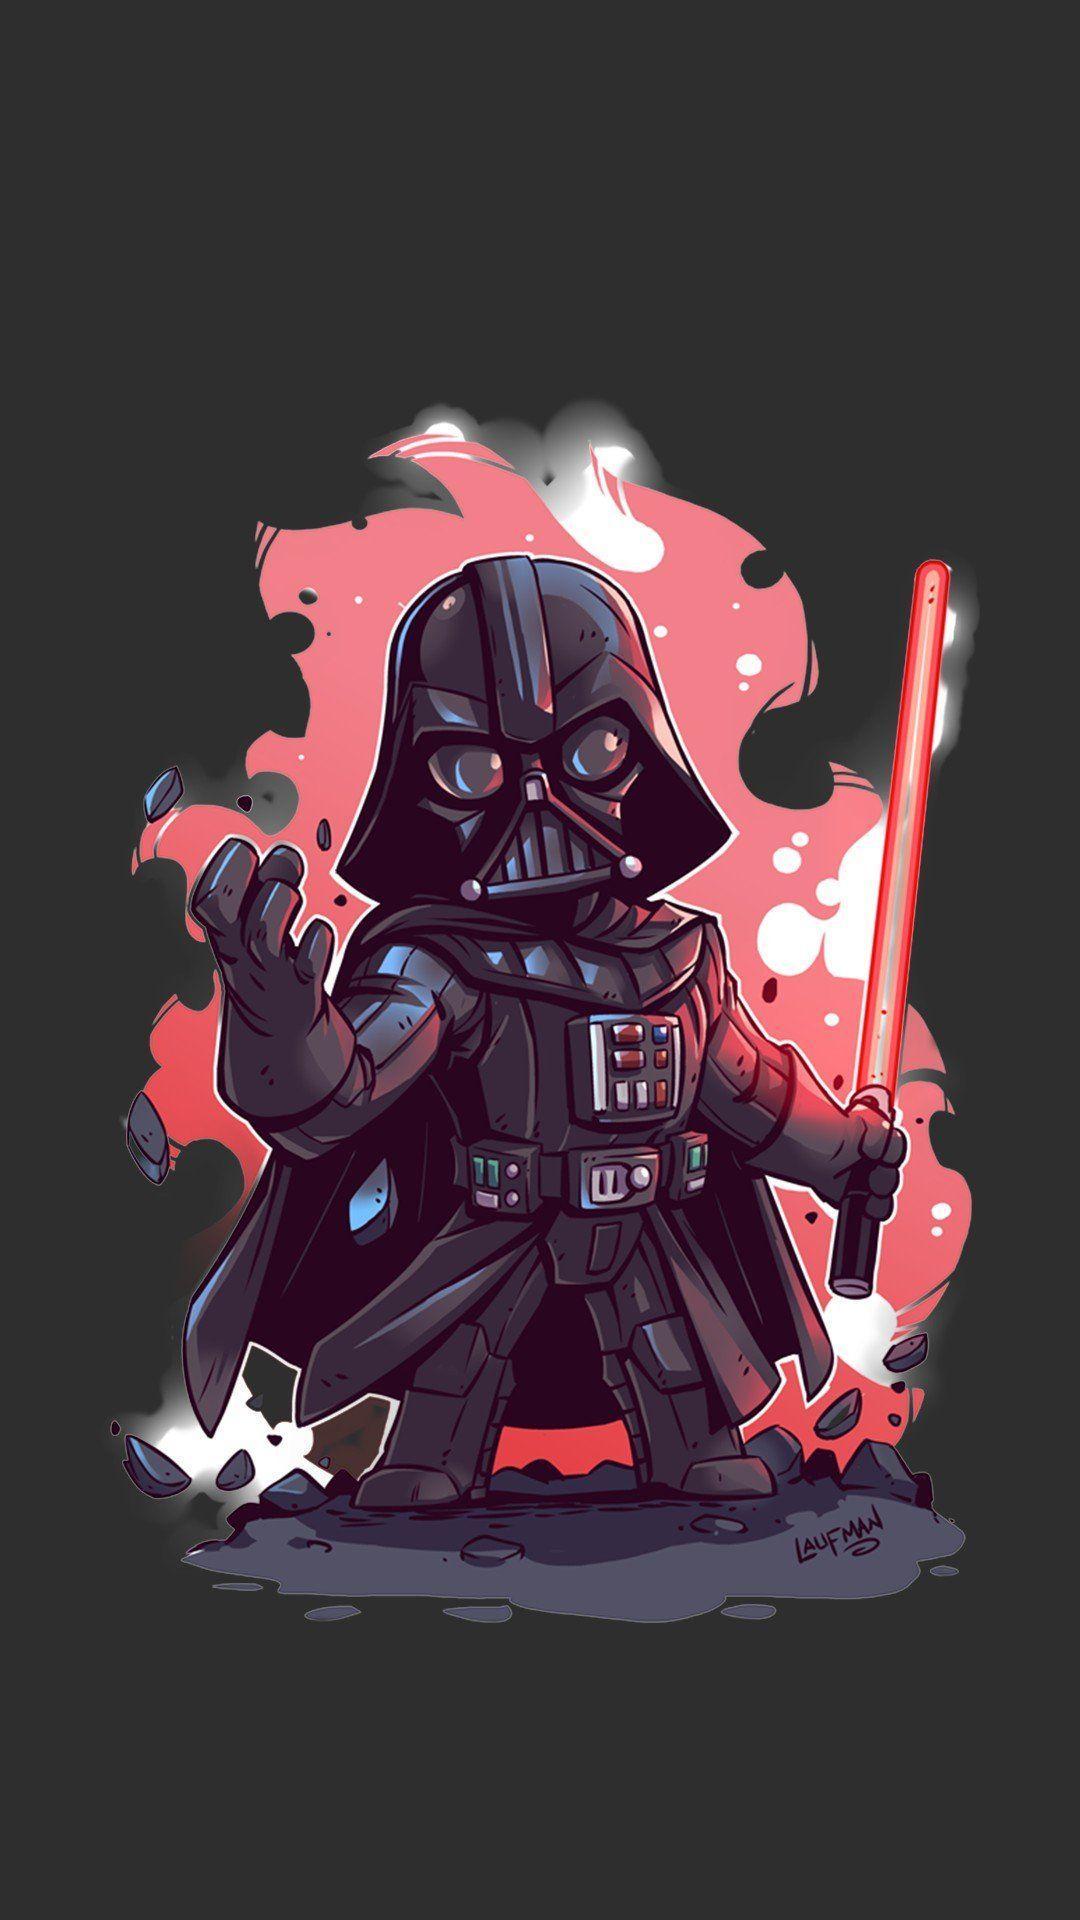 Darth Vader Cartoon Wallpapers Top Free Darth Vader Cartoon